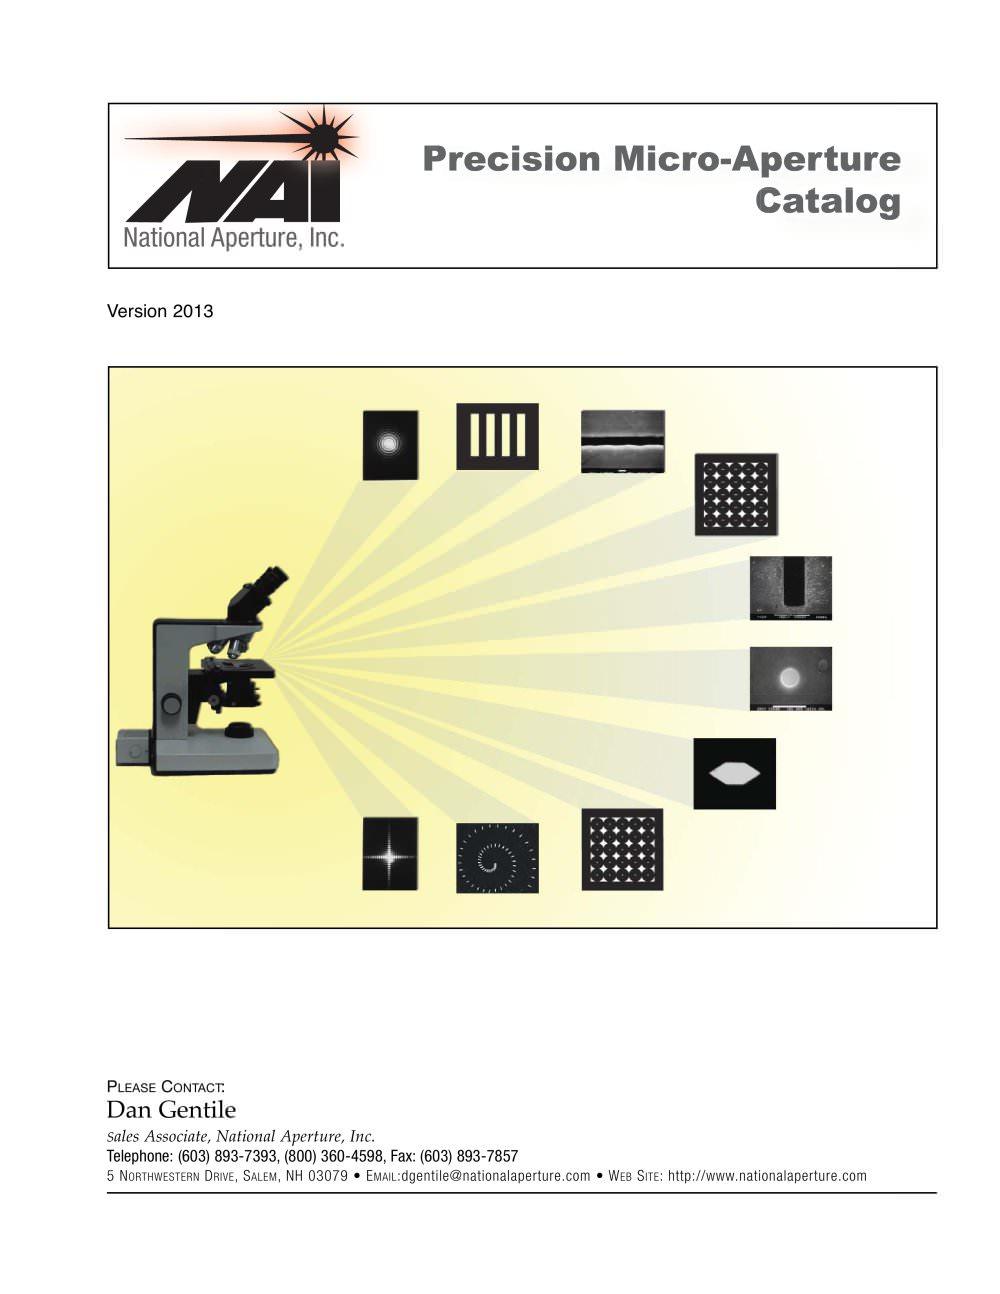 Micro apertures catalog national aperture inc pdf catalogue micro apertures catalog 1 14 pages pooptronica Images